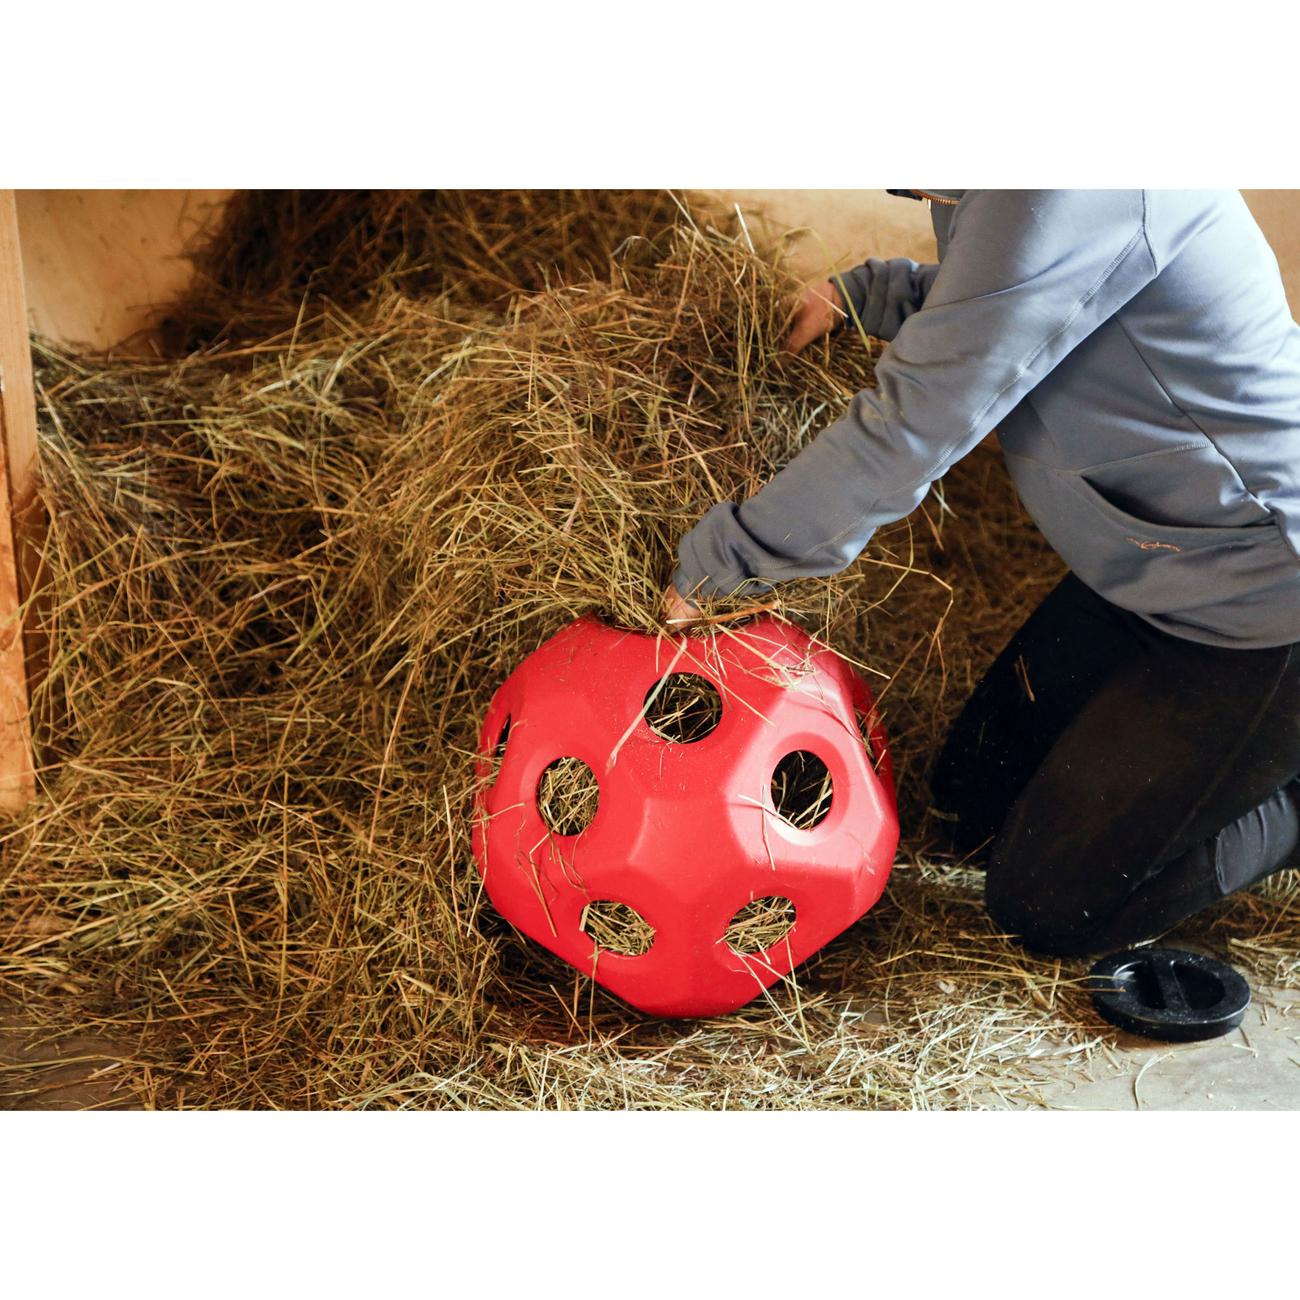 Kerbl HeuBoy Futterspielball für Pferde, Bild 7